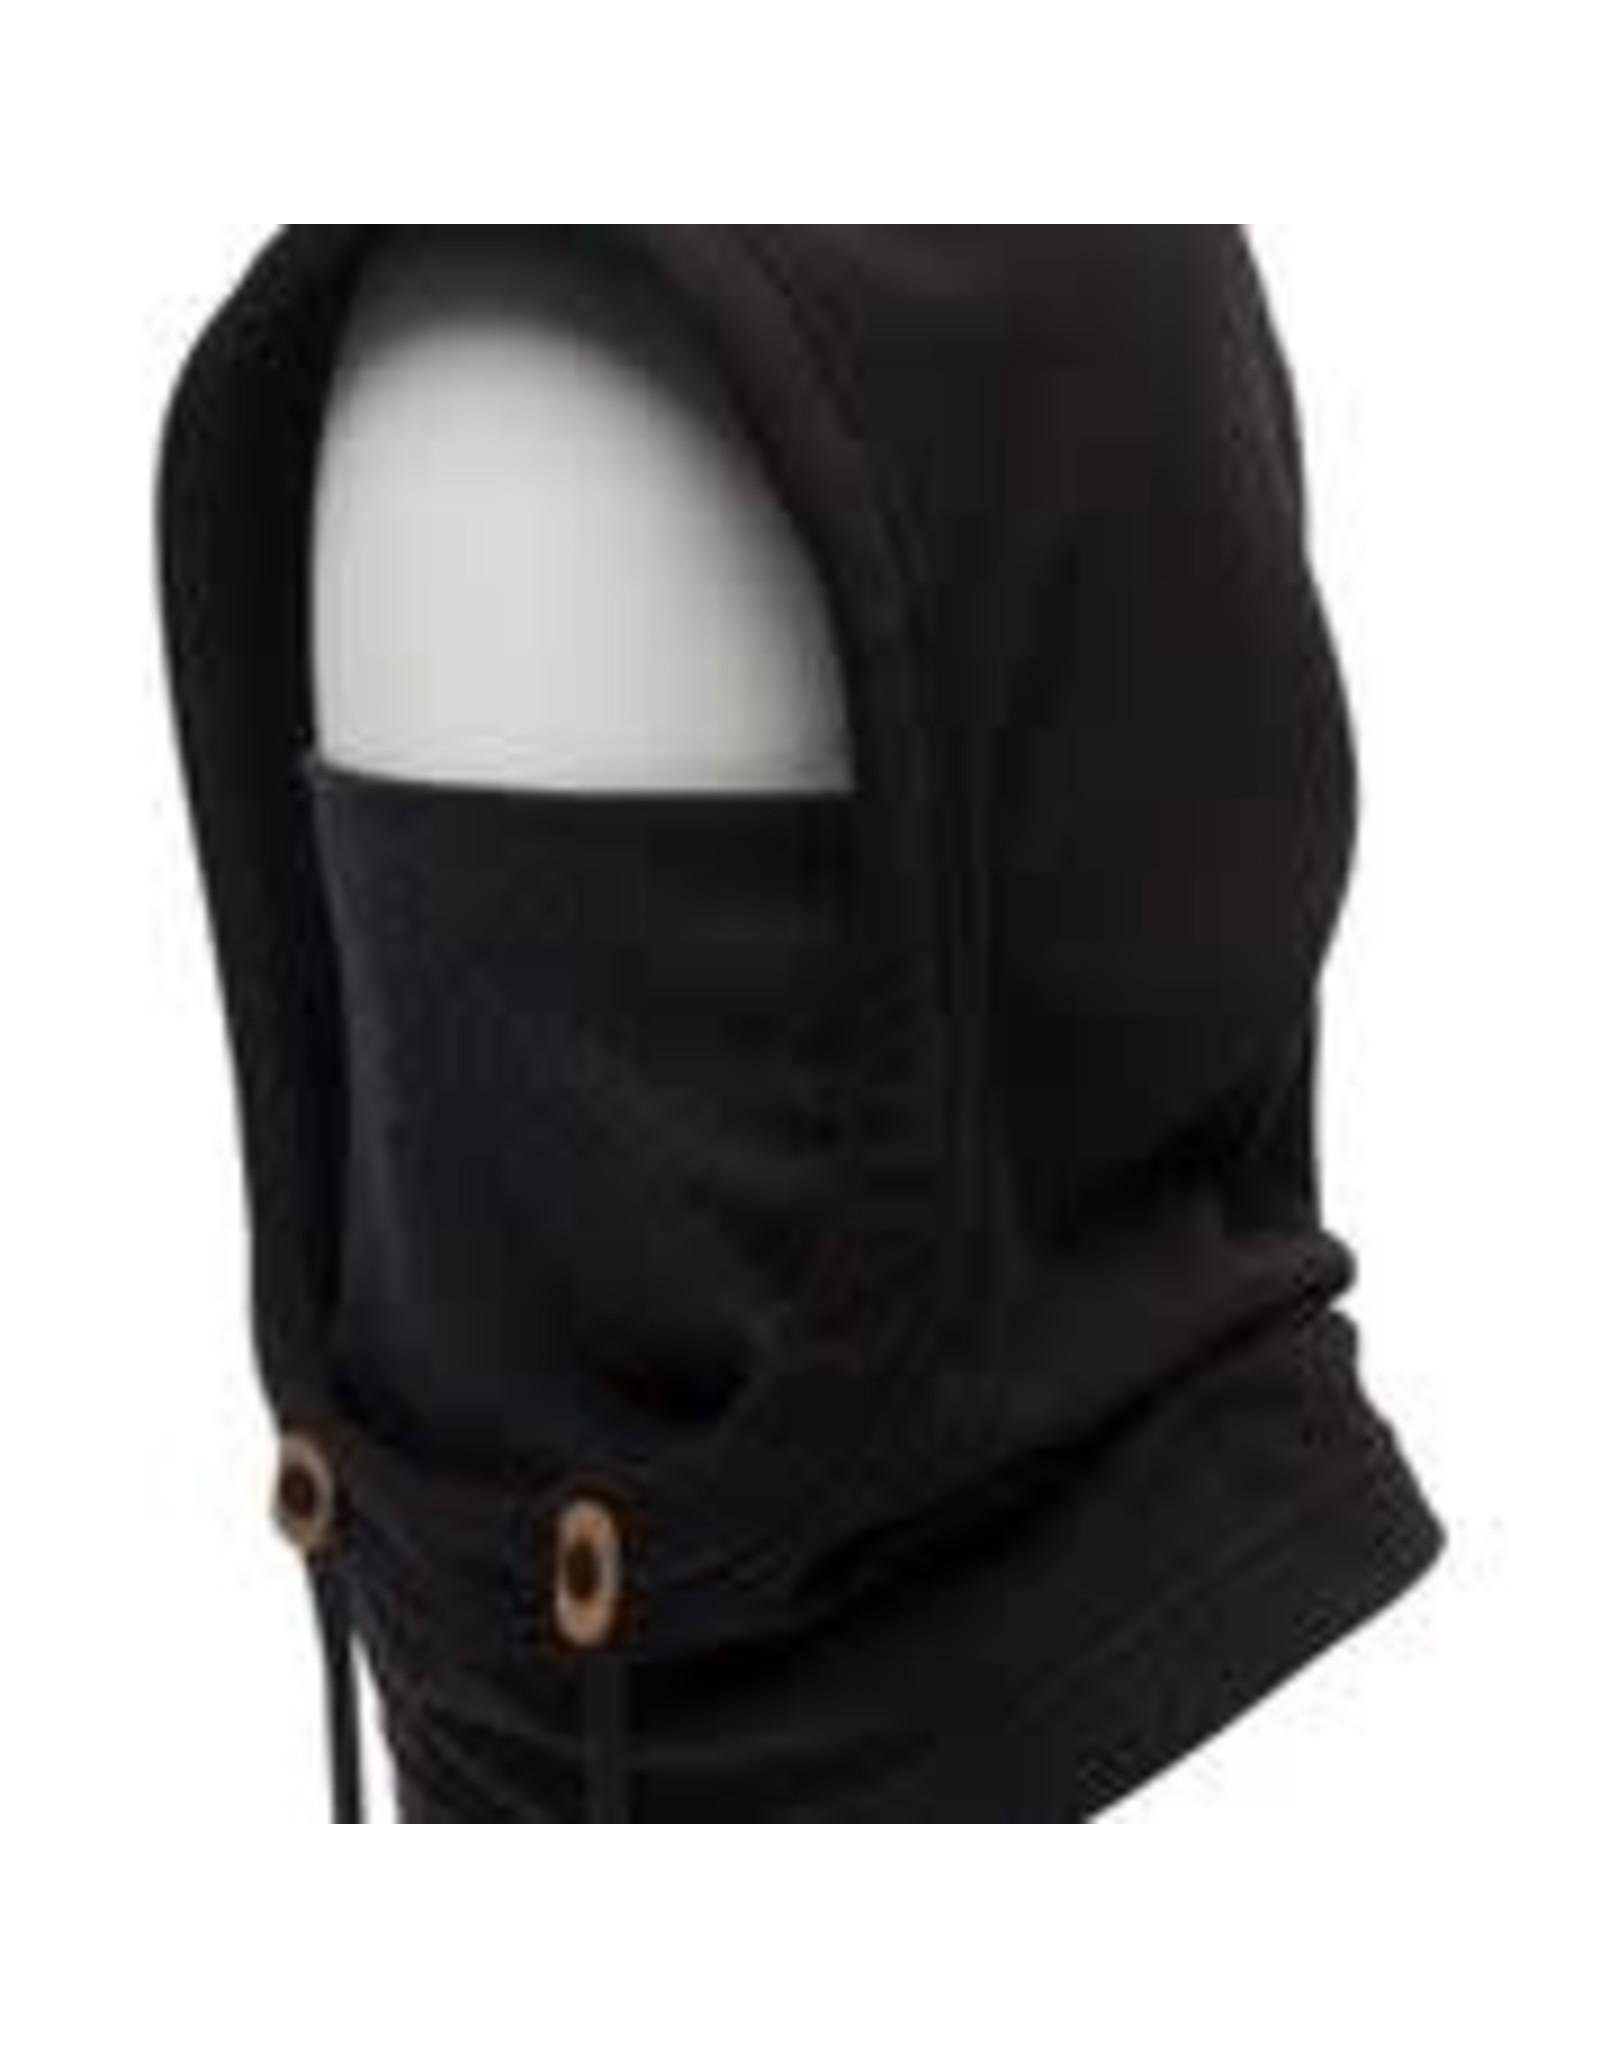 686 686 - Cagoule tarmac fleece hood black